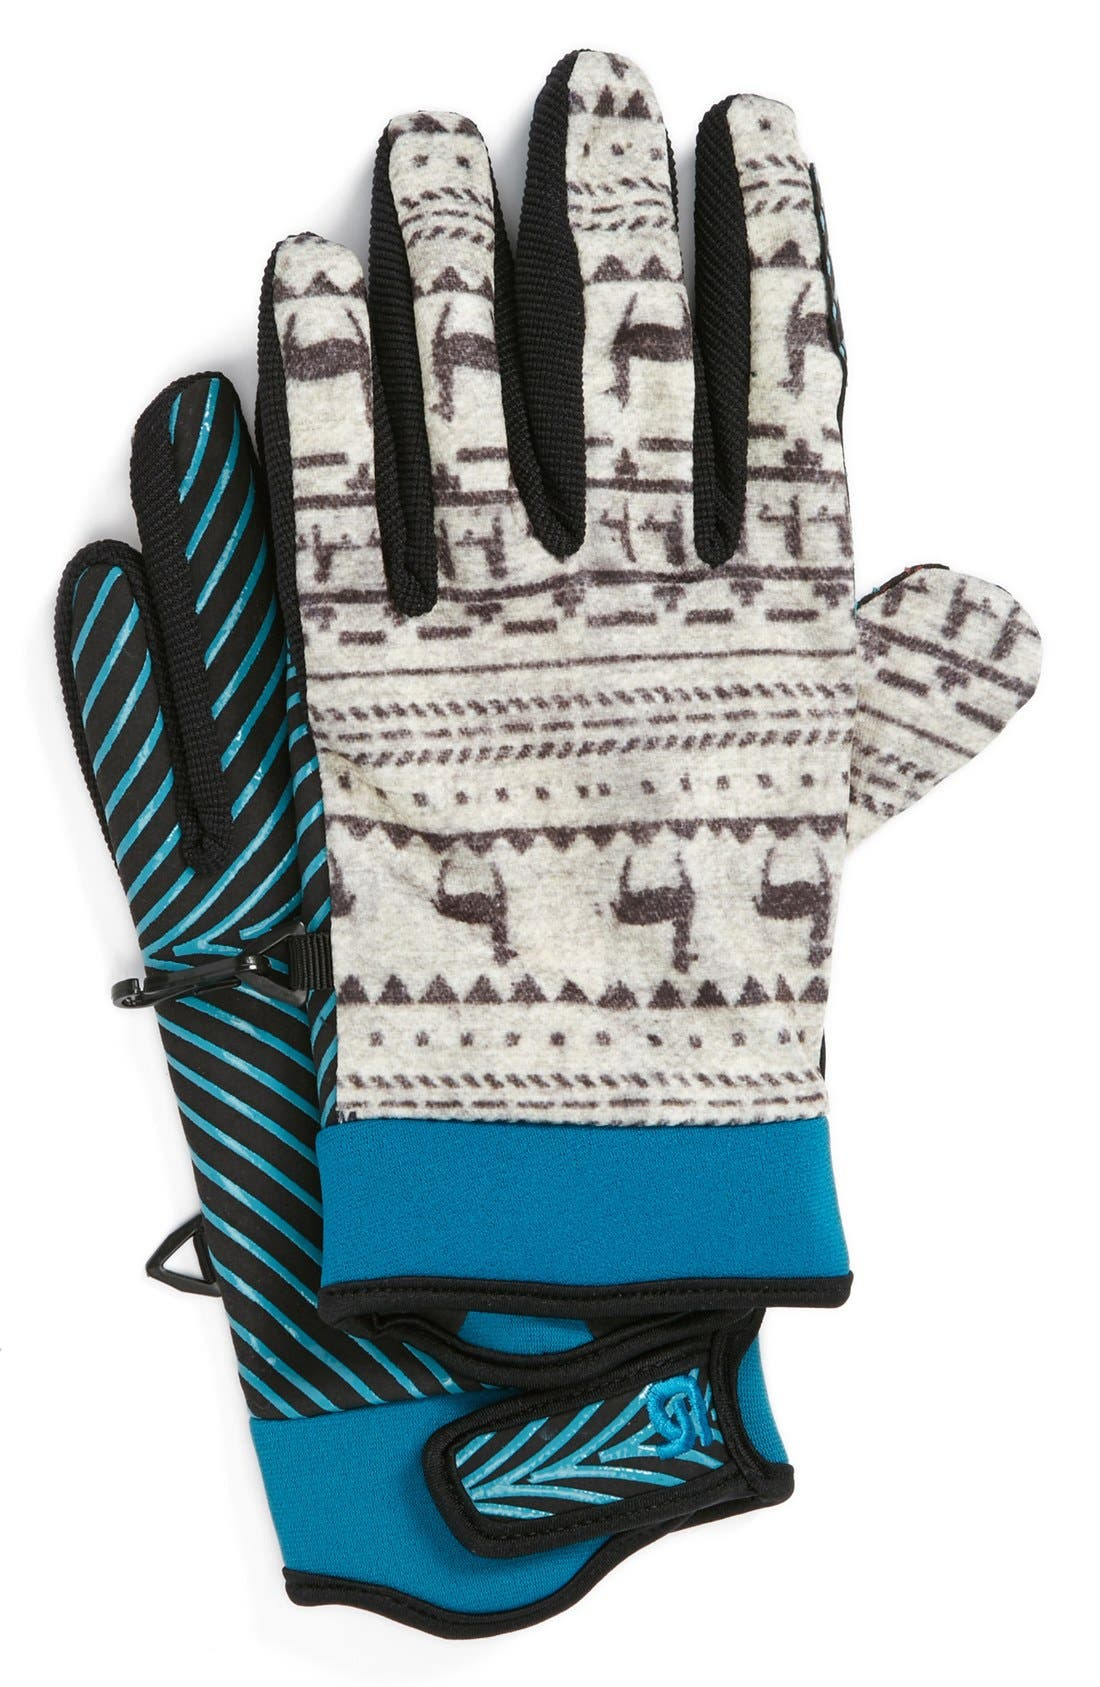 Alternate Image 1 Selected - Burton 'Spectre' Gloves